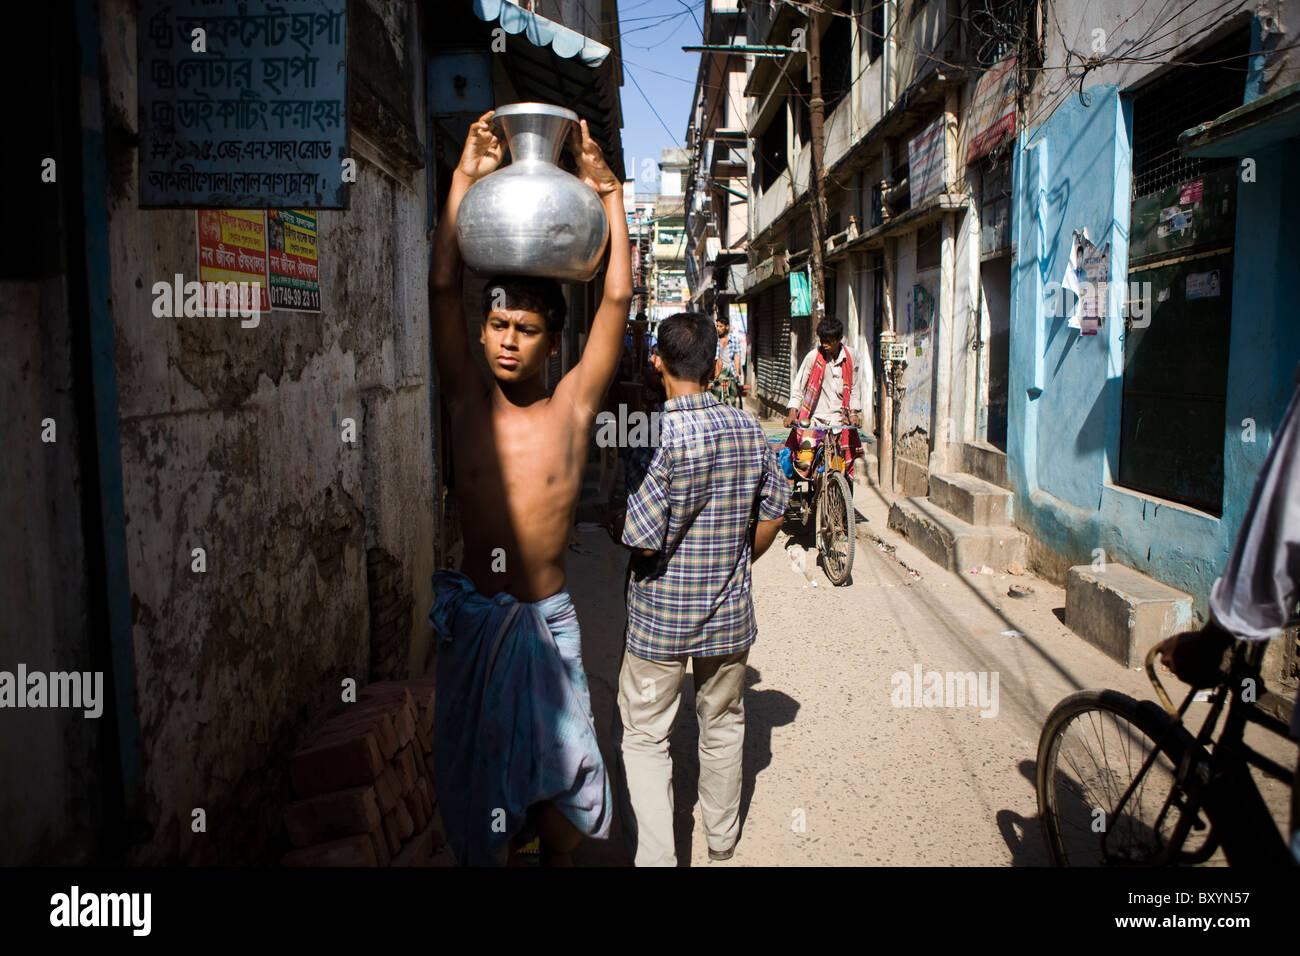 Urban scene in Dhaka, Bangladesh - Stock Image